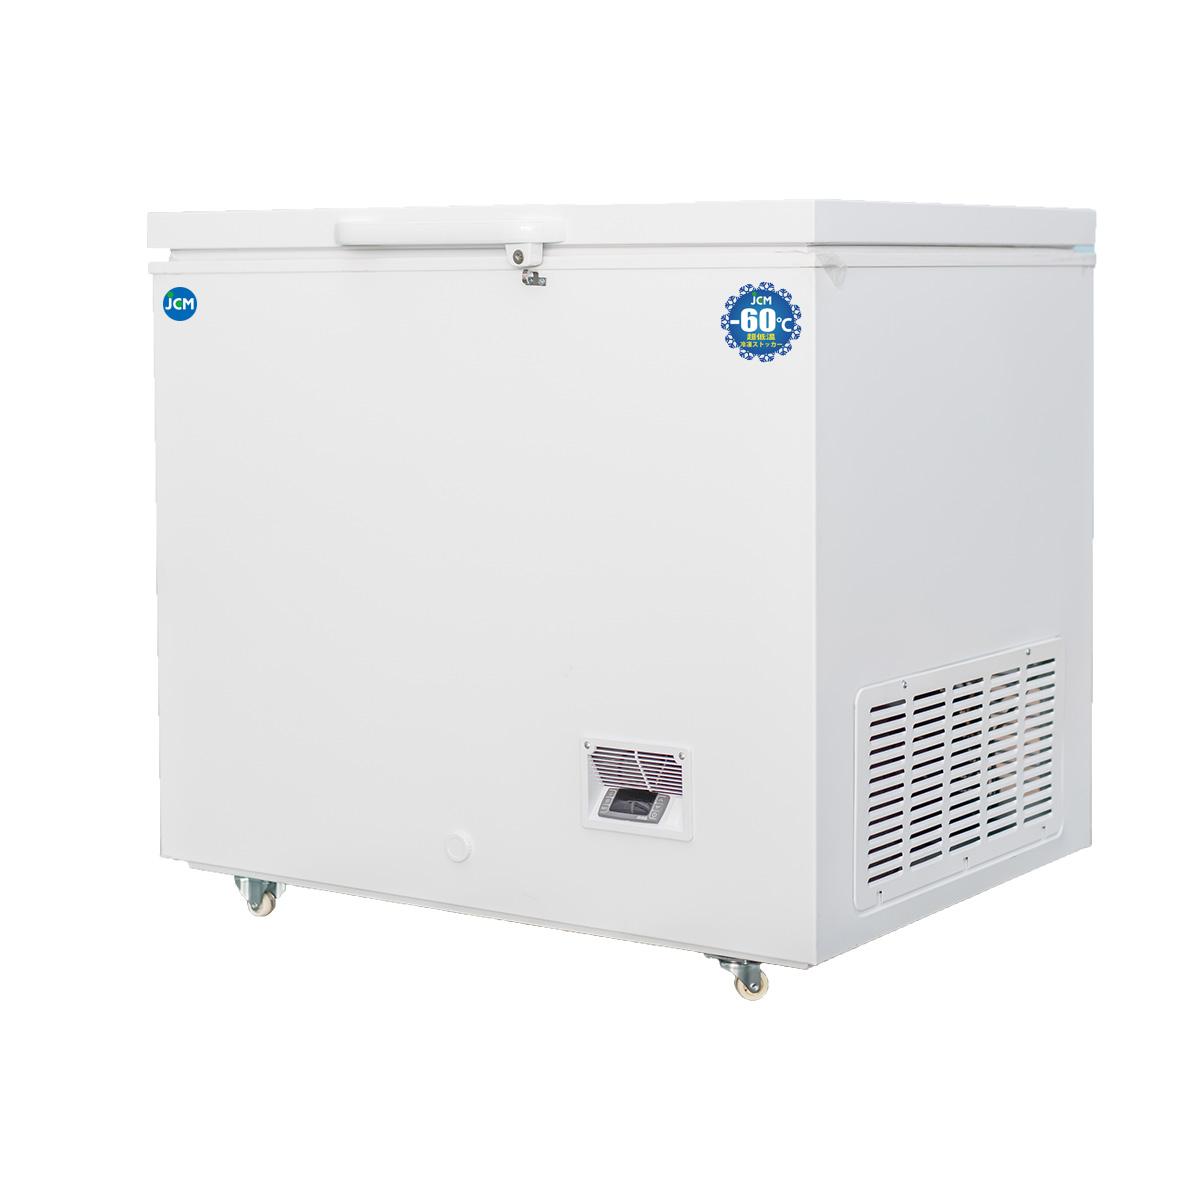 JCM 超低温冷凍ストッカー 174L JCMCC-170 業務用 -60℃ 超低温 冷凍庫 冷凍ストッカー ストッカー 【代引不可】